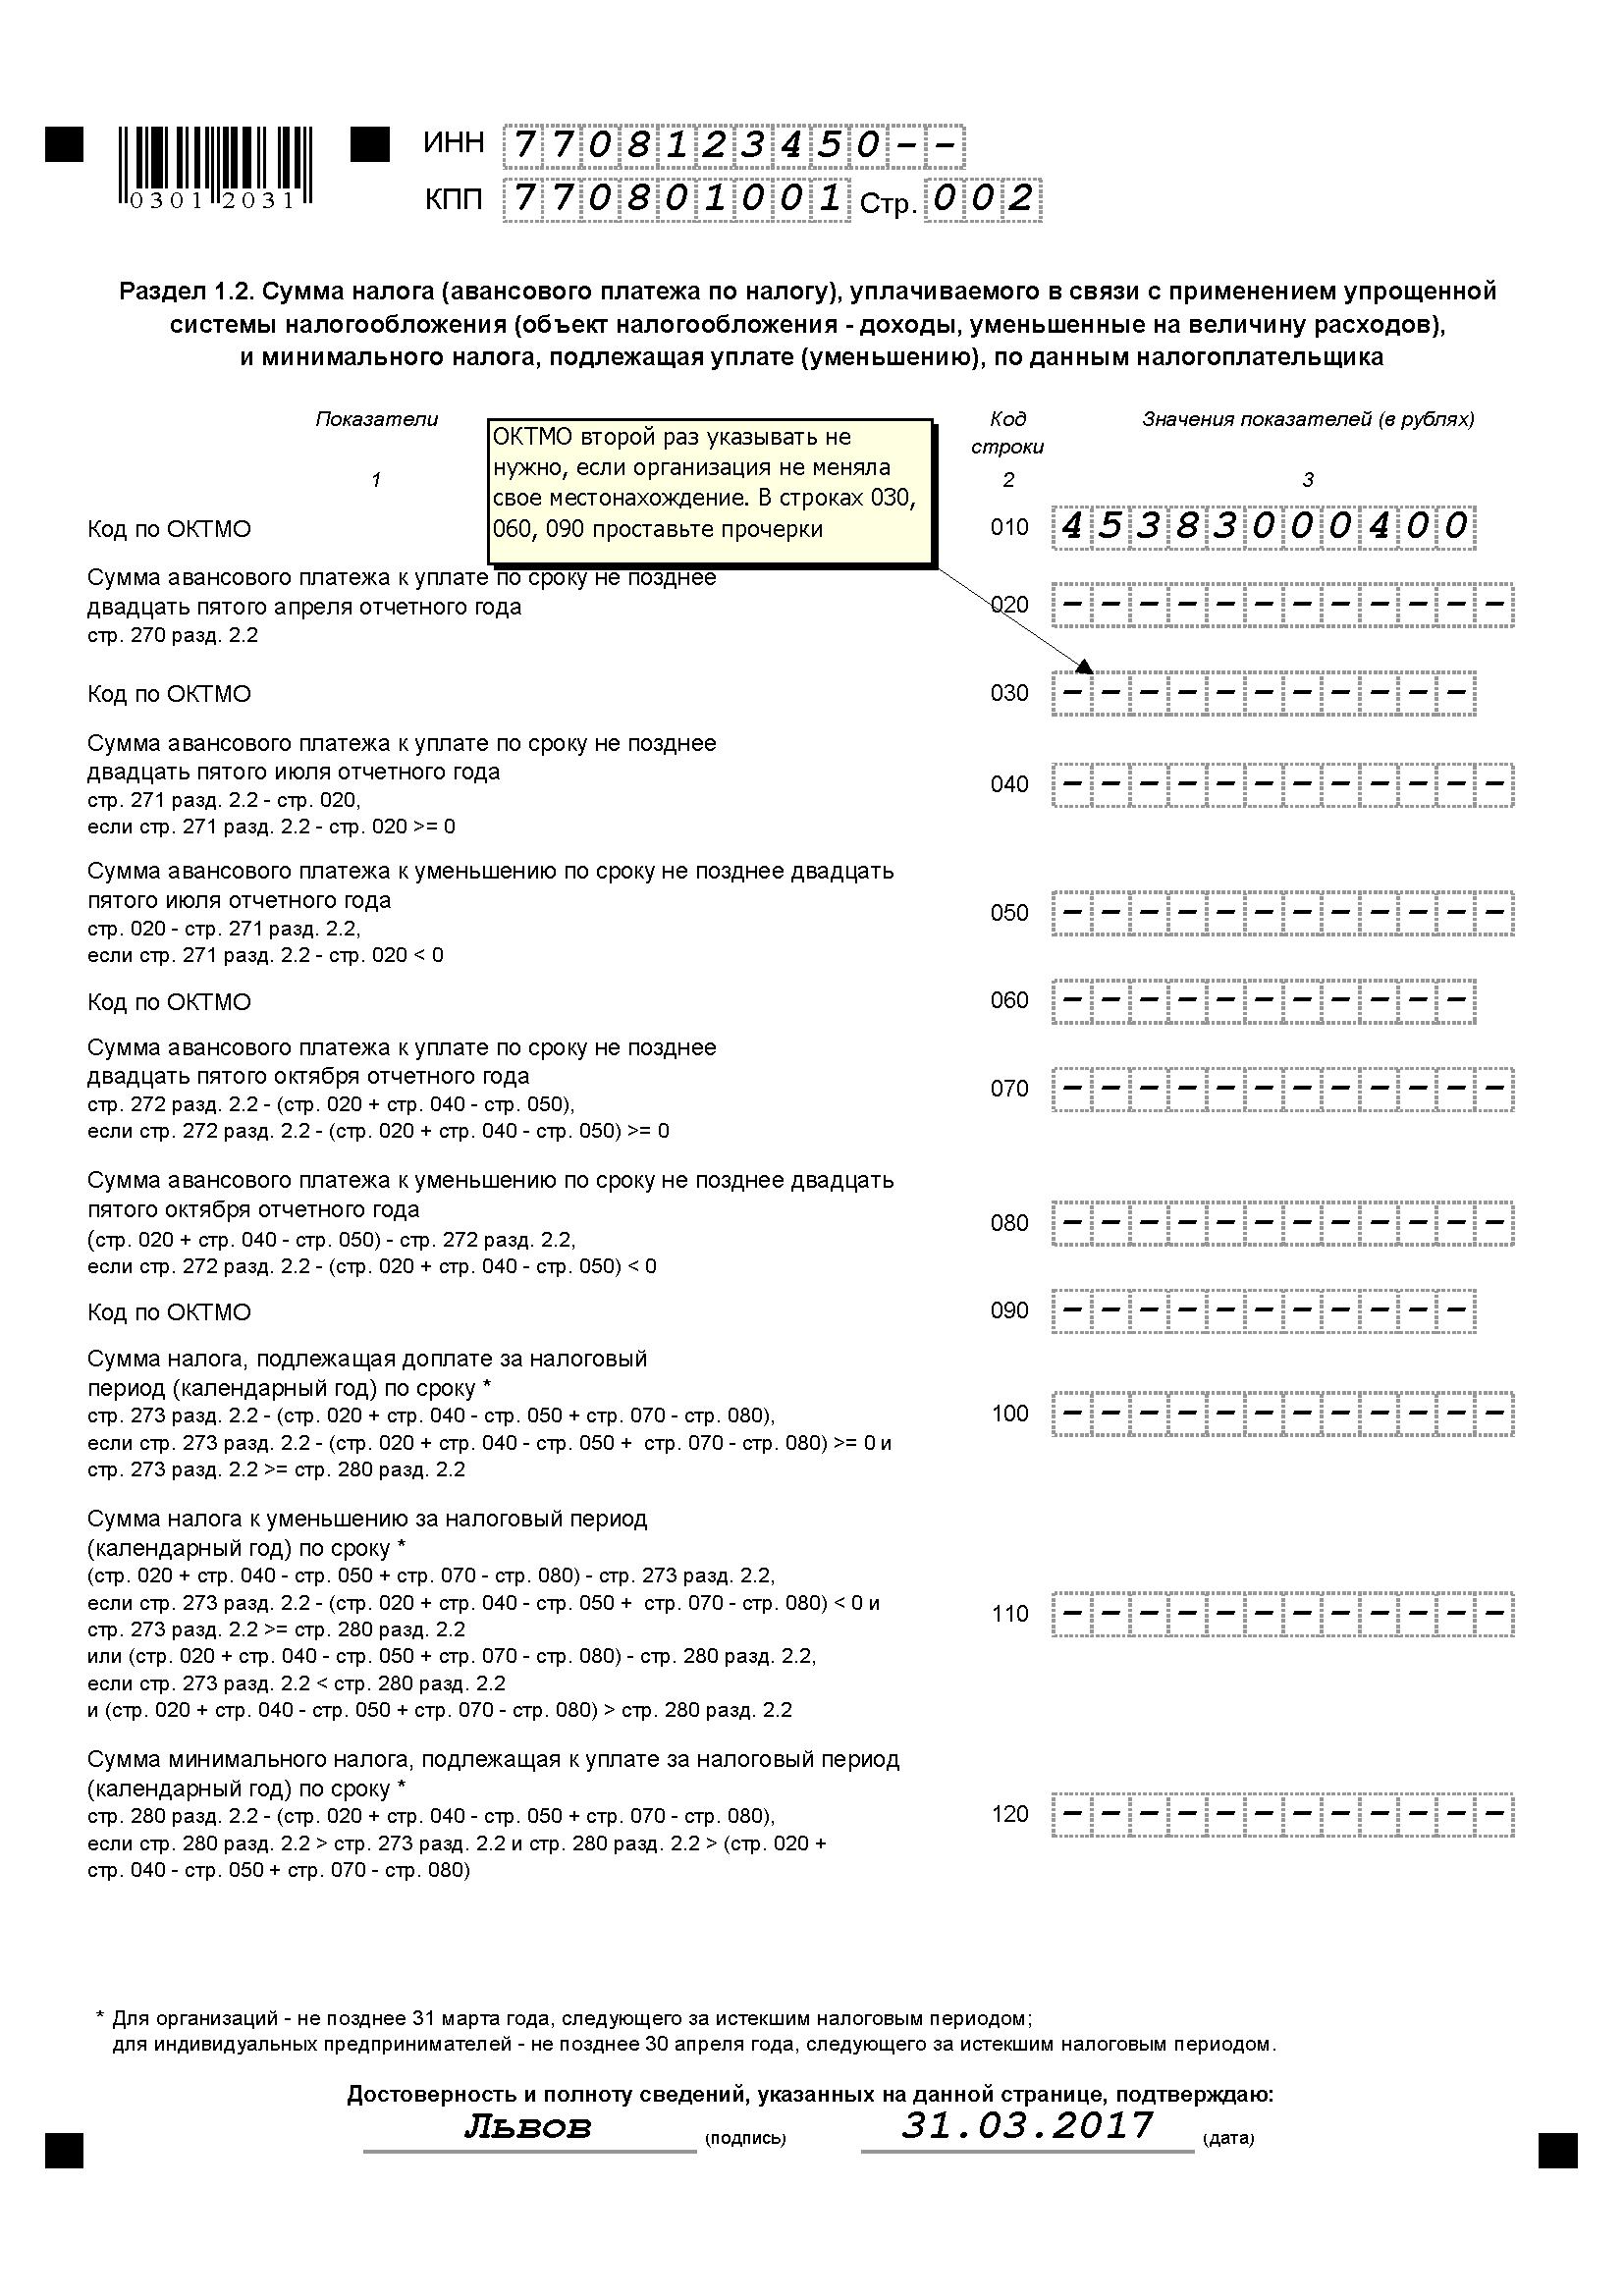 образец приказа о выдаче беспроцентного займа сотруднику